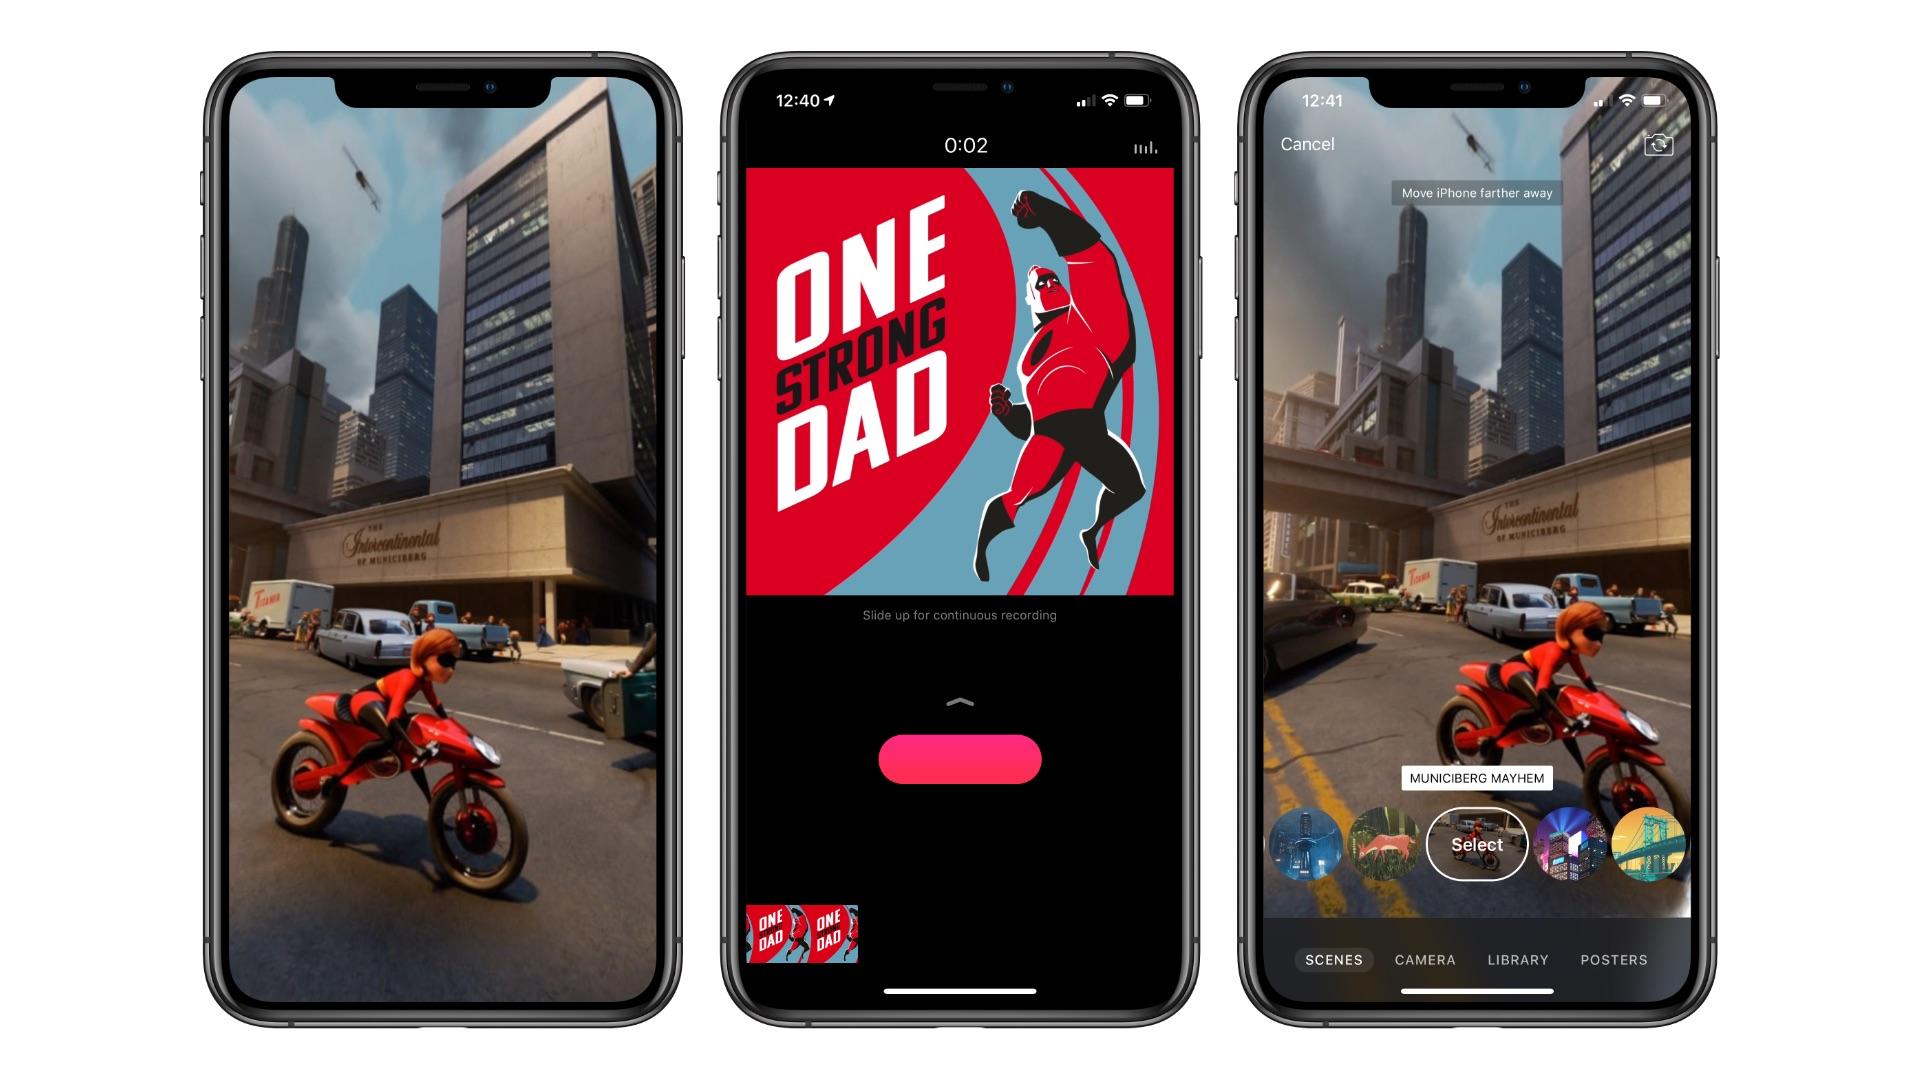 Apple's Clips app gains six Selfie Scenes, Incredibles 2